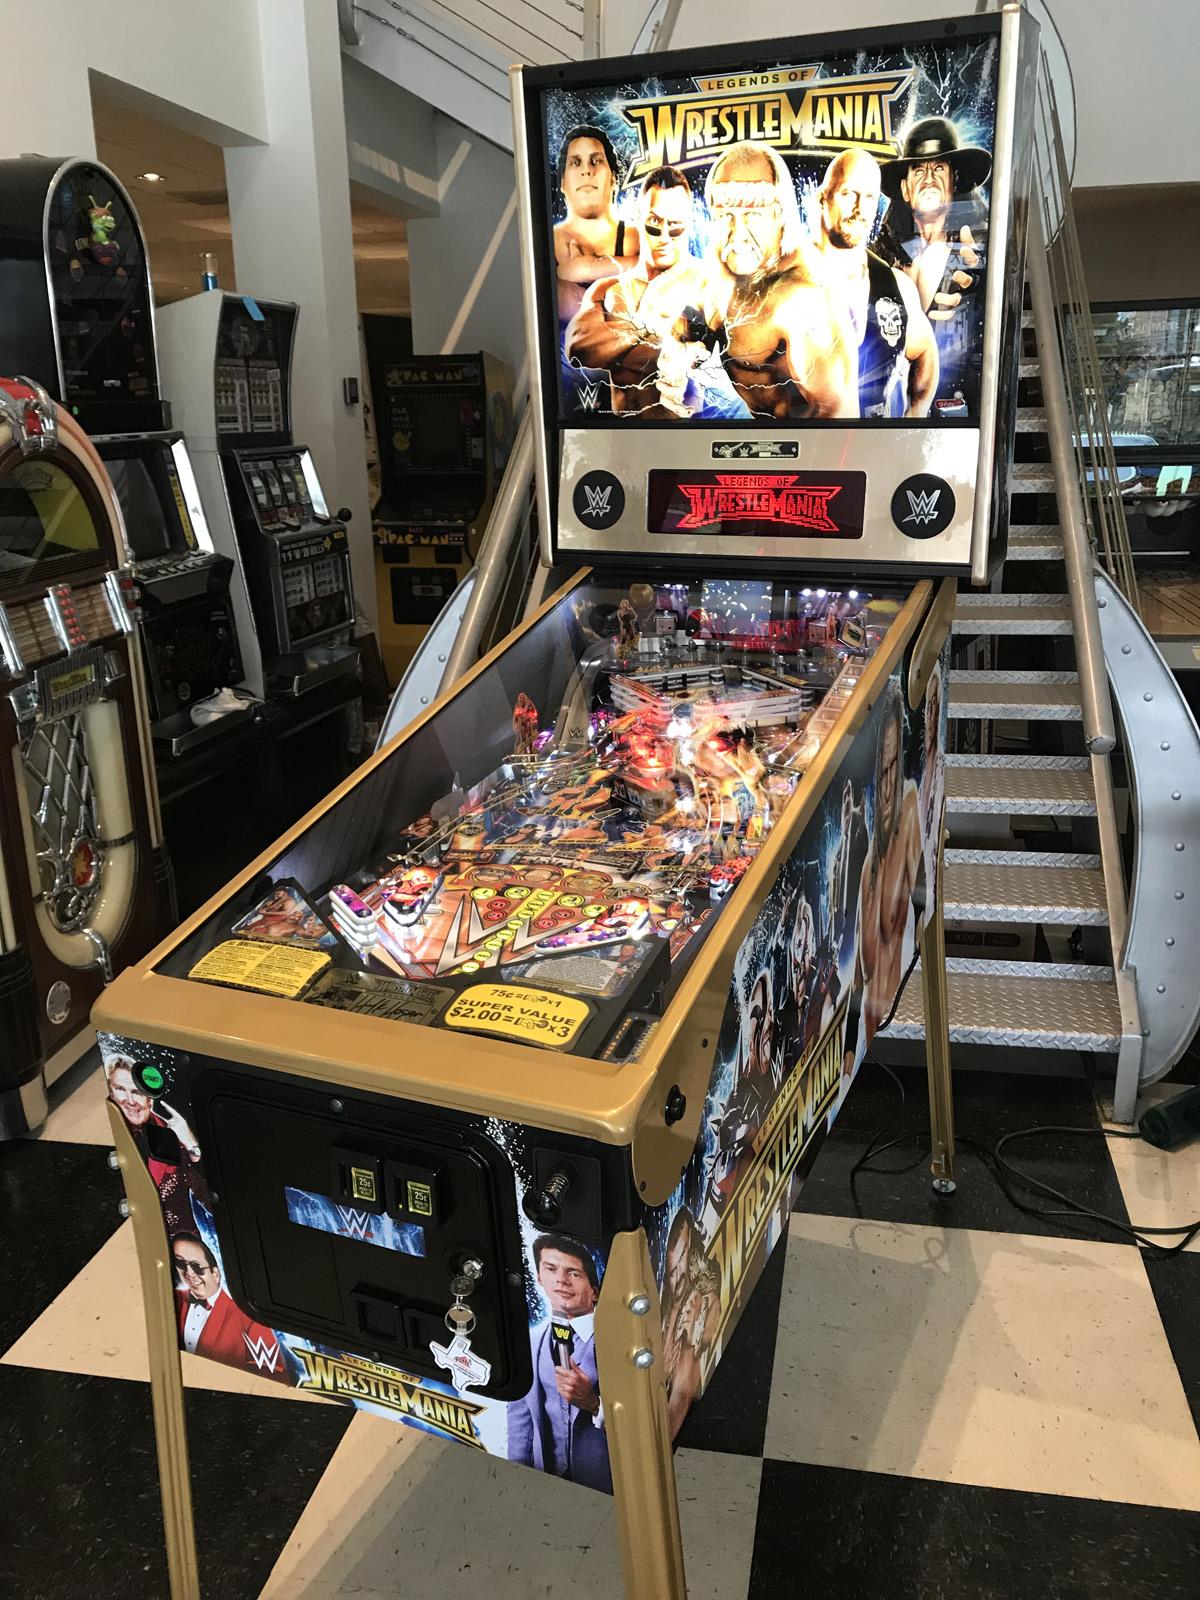 Wwe Legends Of Wrestlemania Limited Edition Pinball Machine Fun